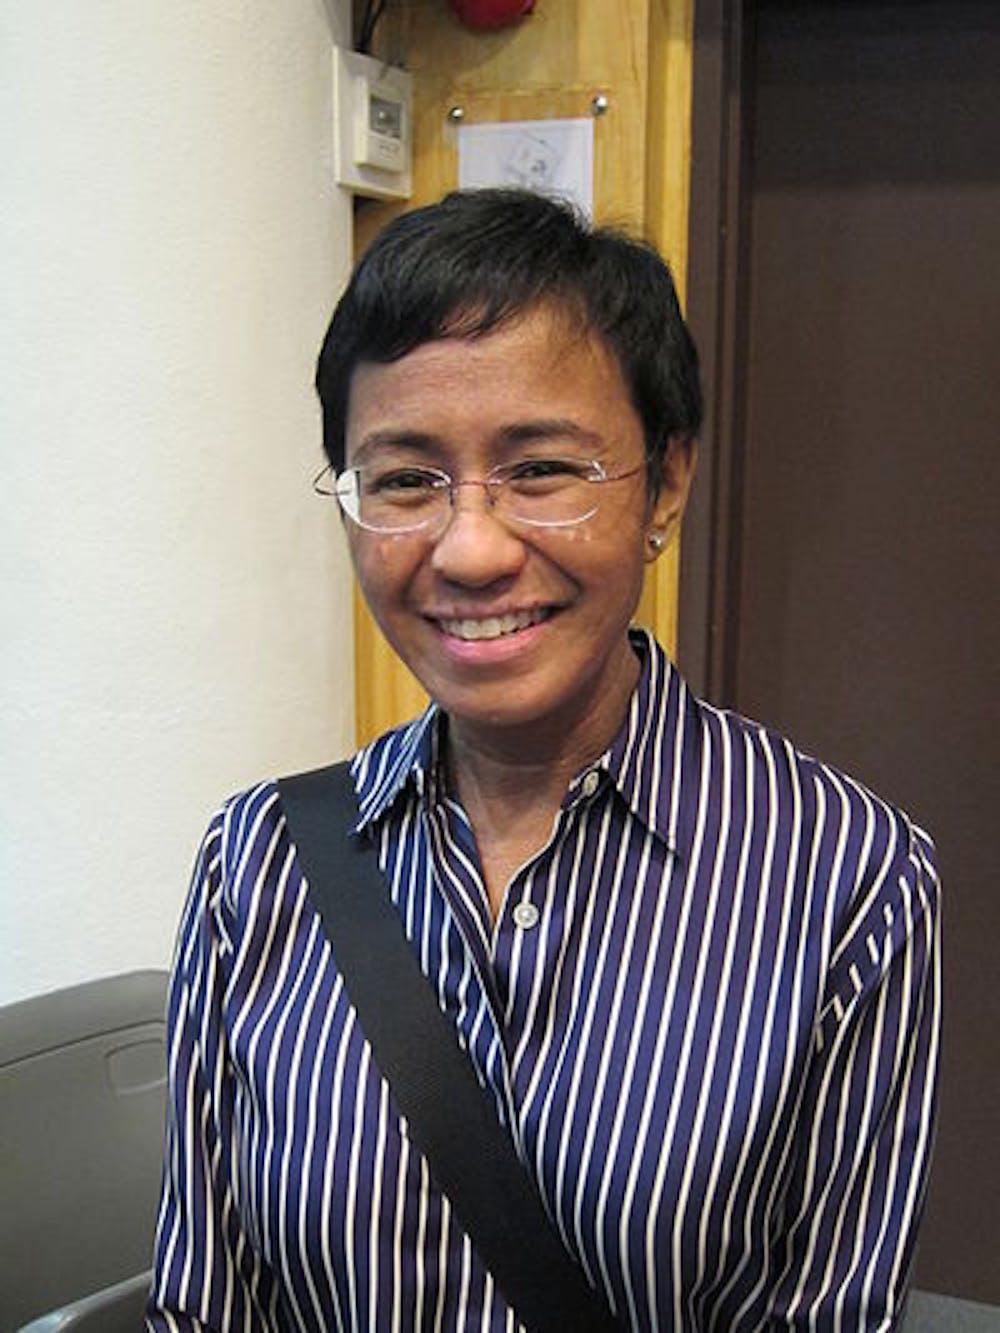 "<p>Courtesy of <a href=""https://commons.wikimedia.org/wiki/Category:Maria_Ressa#/media/File:Maria_Ressa.jpg"" target=""_self"">Joshua Lim / Wikimedia Commons</a></p>"